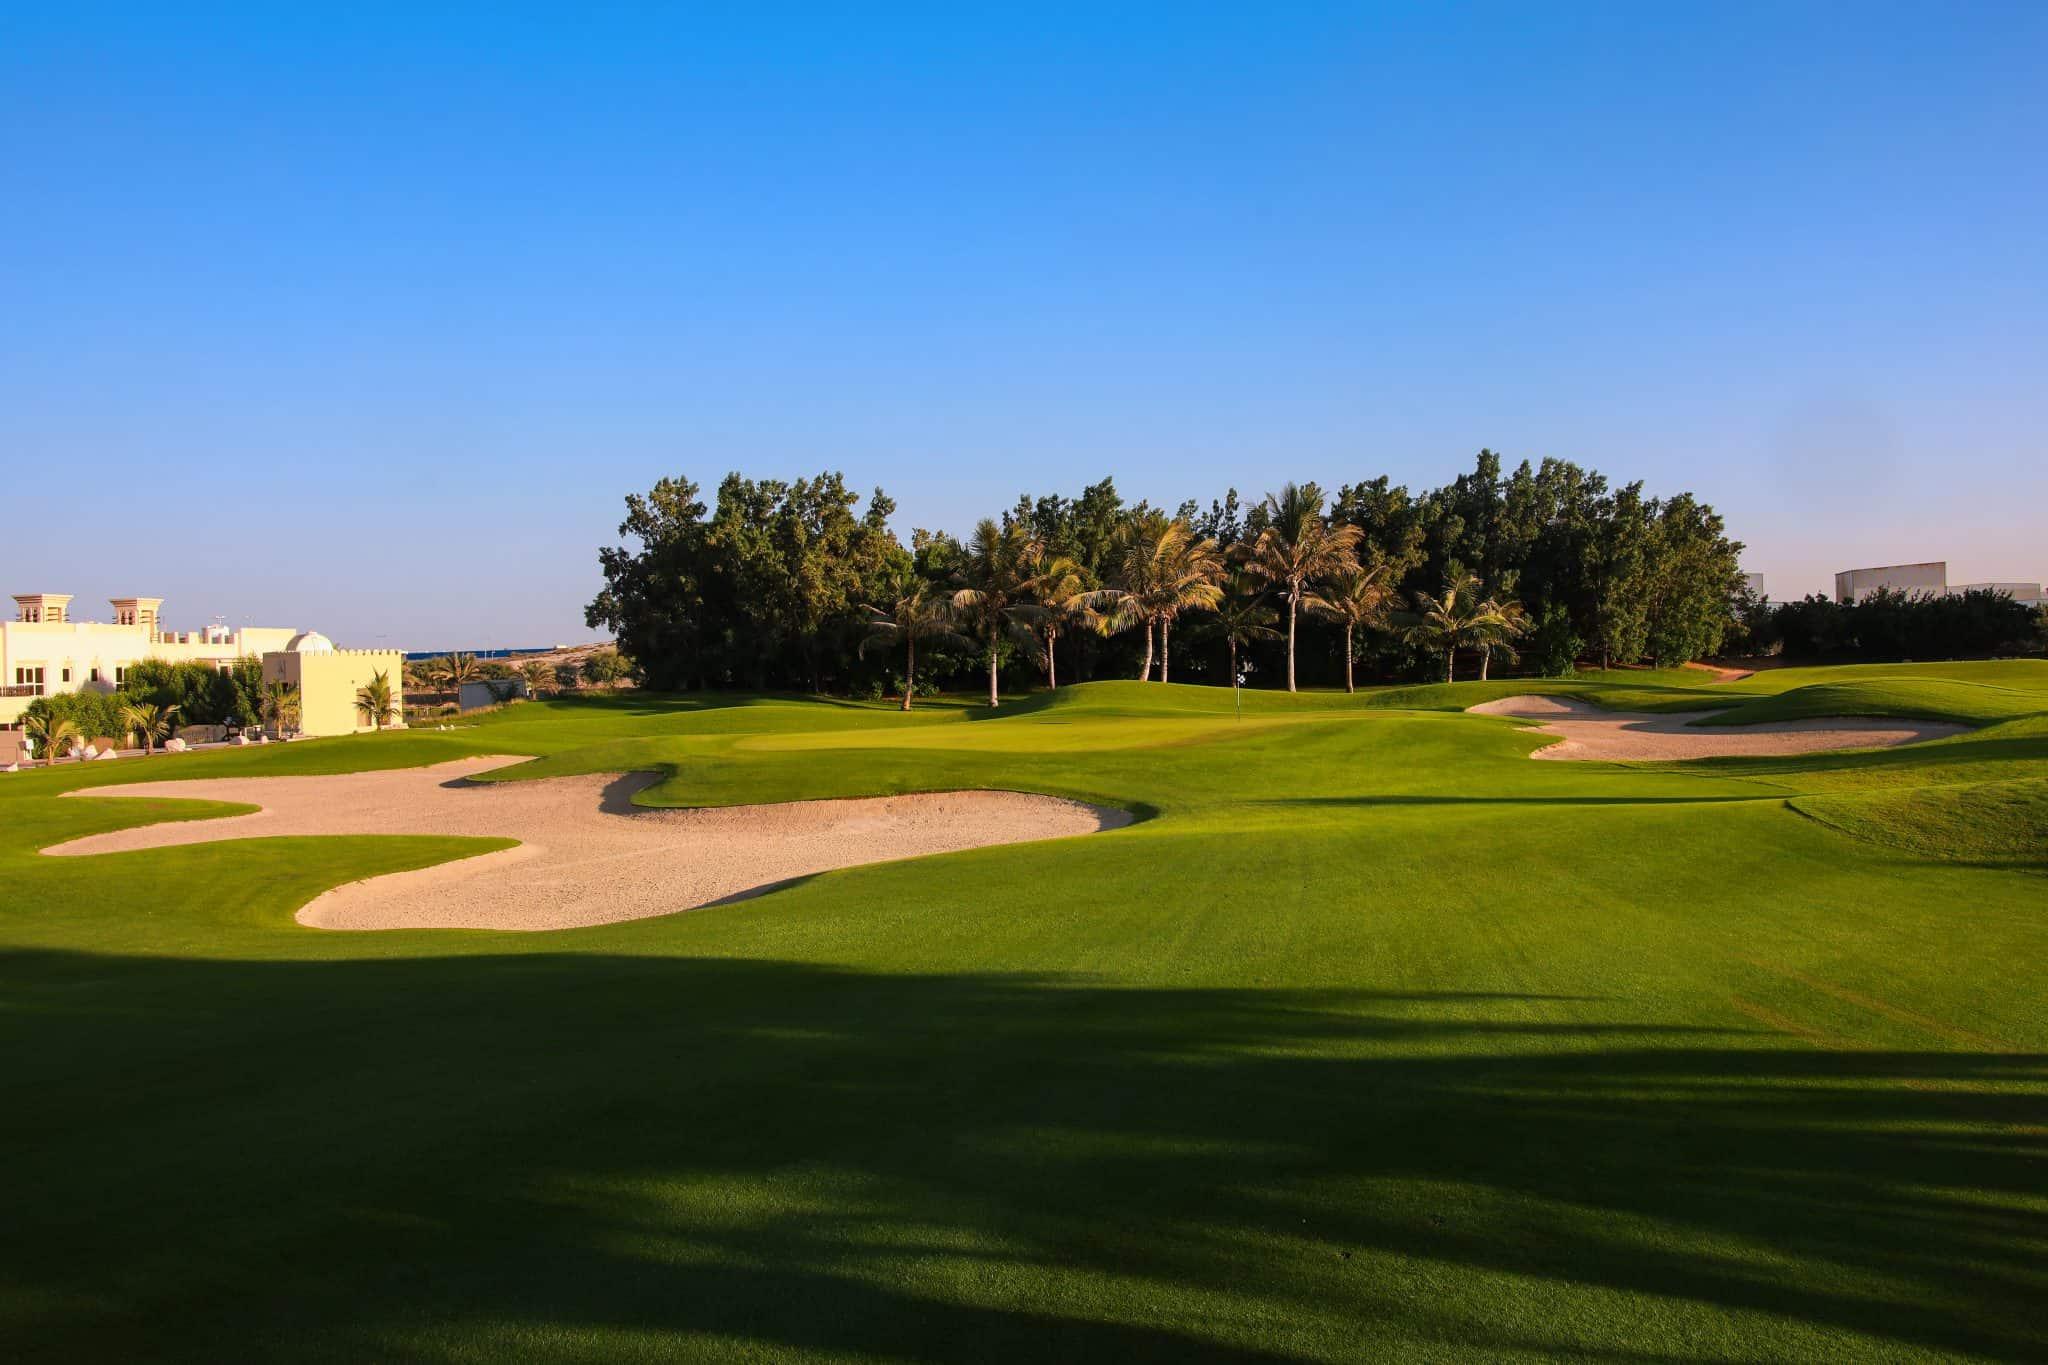 Al Hamra Golf Club Ras Al Khaimah